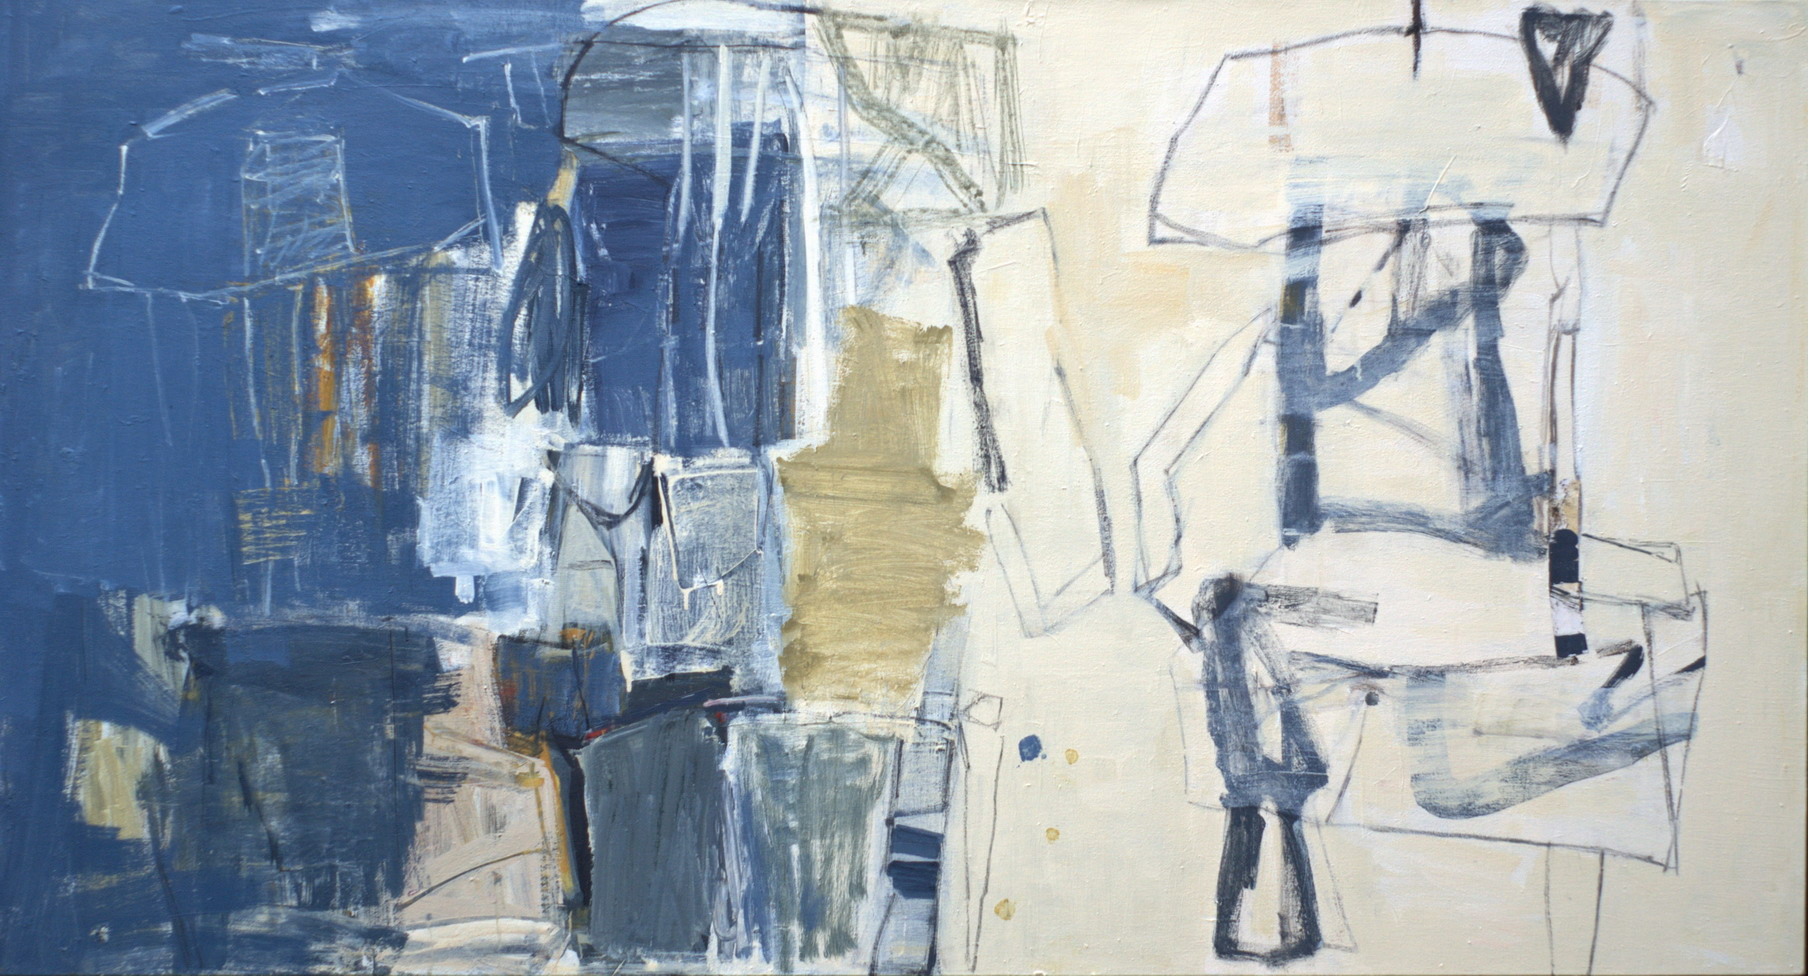 14 Shireen Kamran (Pigmentsacrylics on canvas) 38'' X 70'' Rs. 350,000-_resize